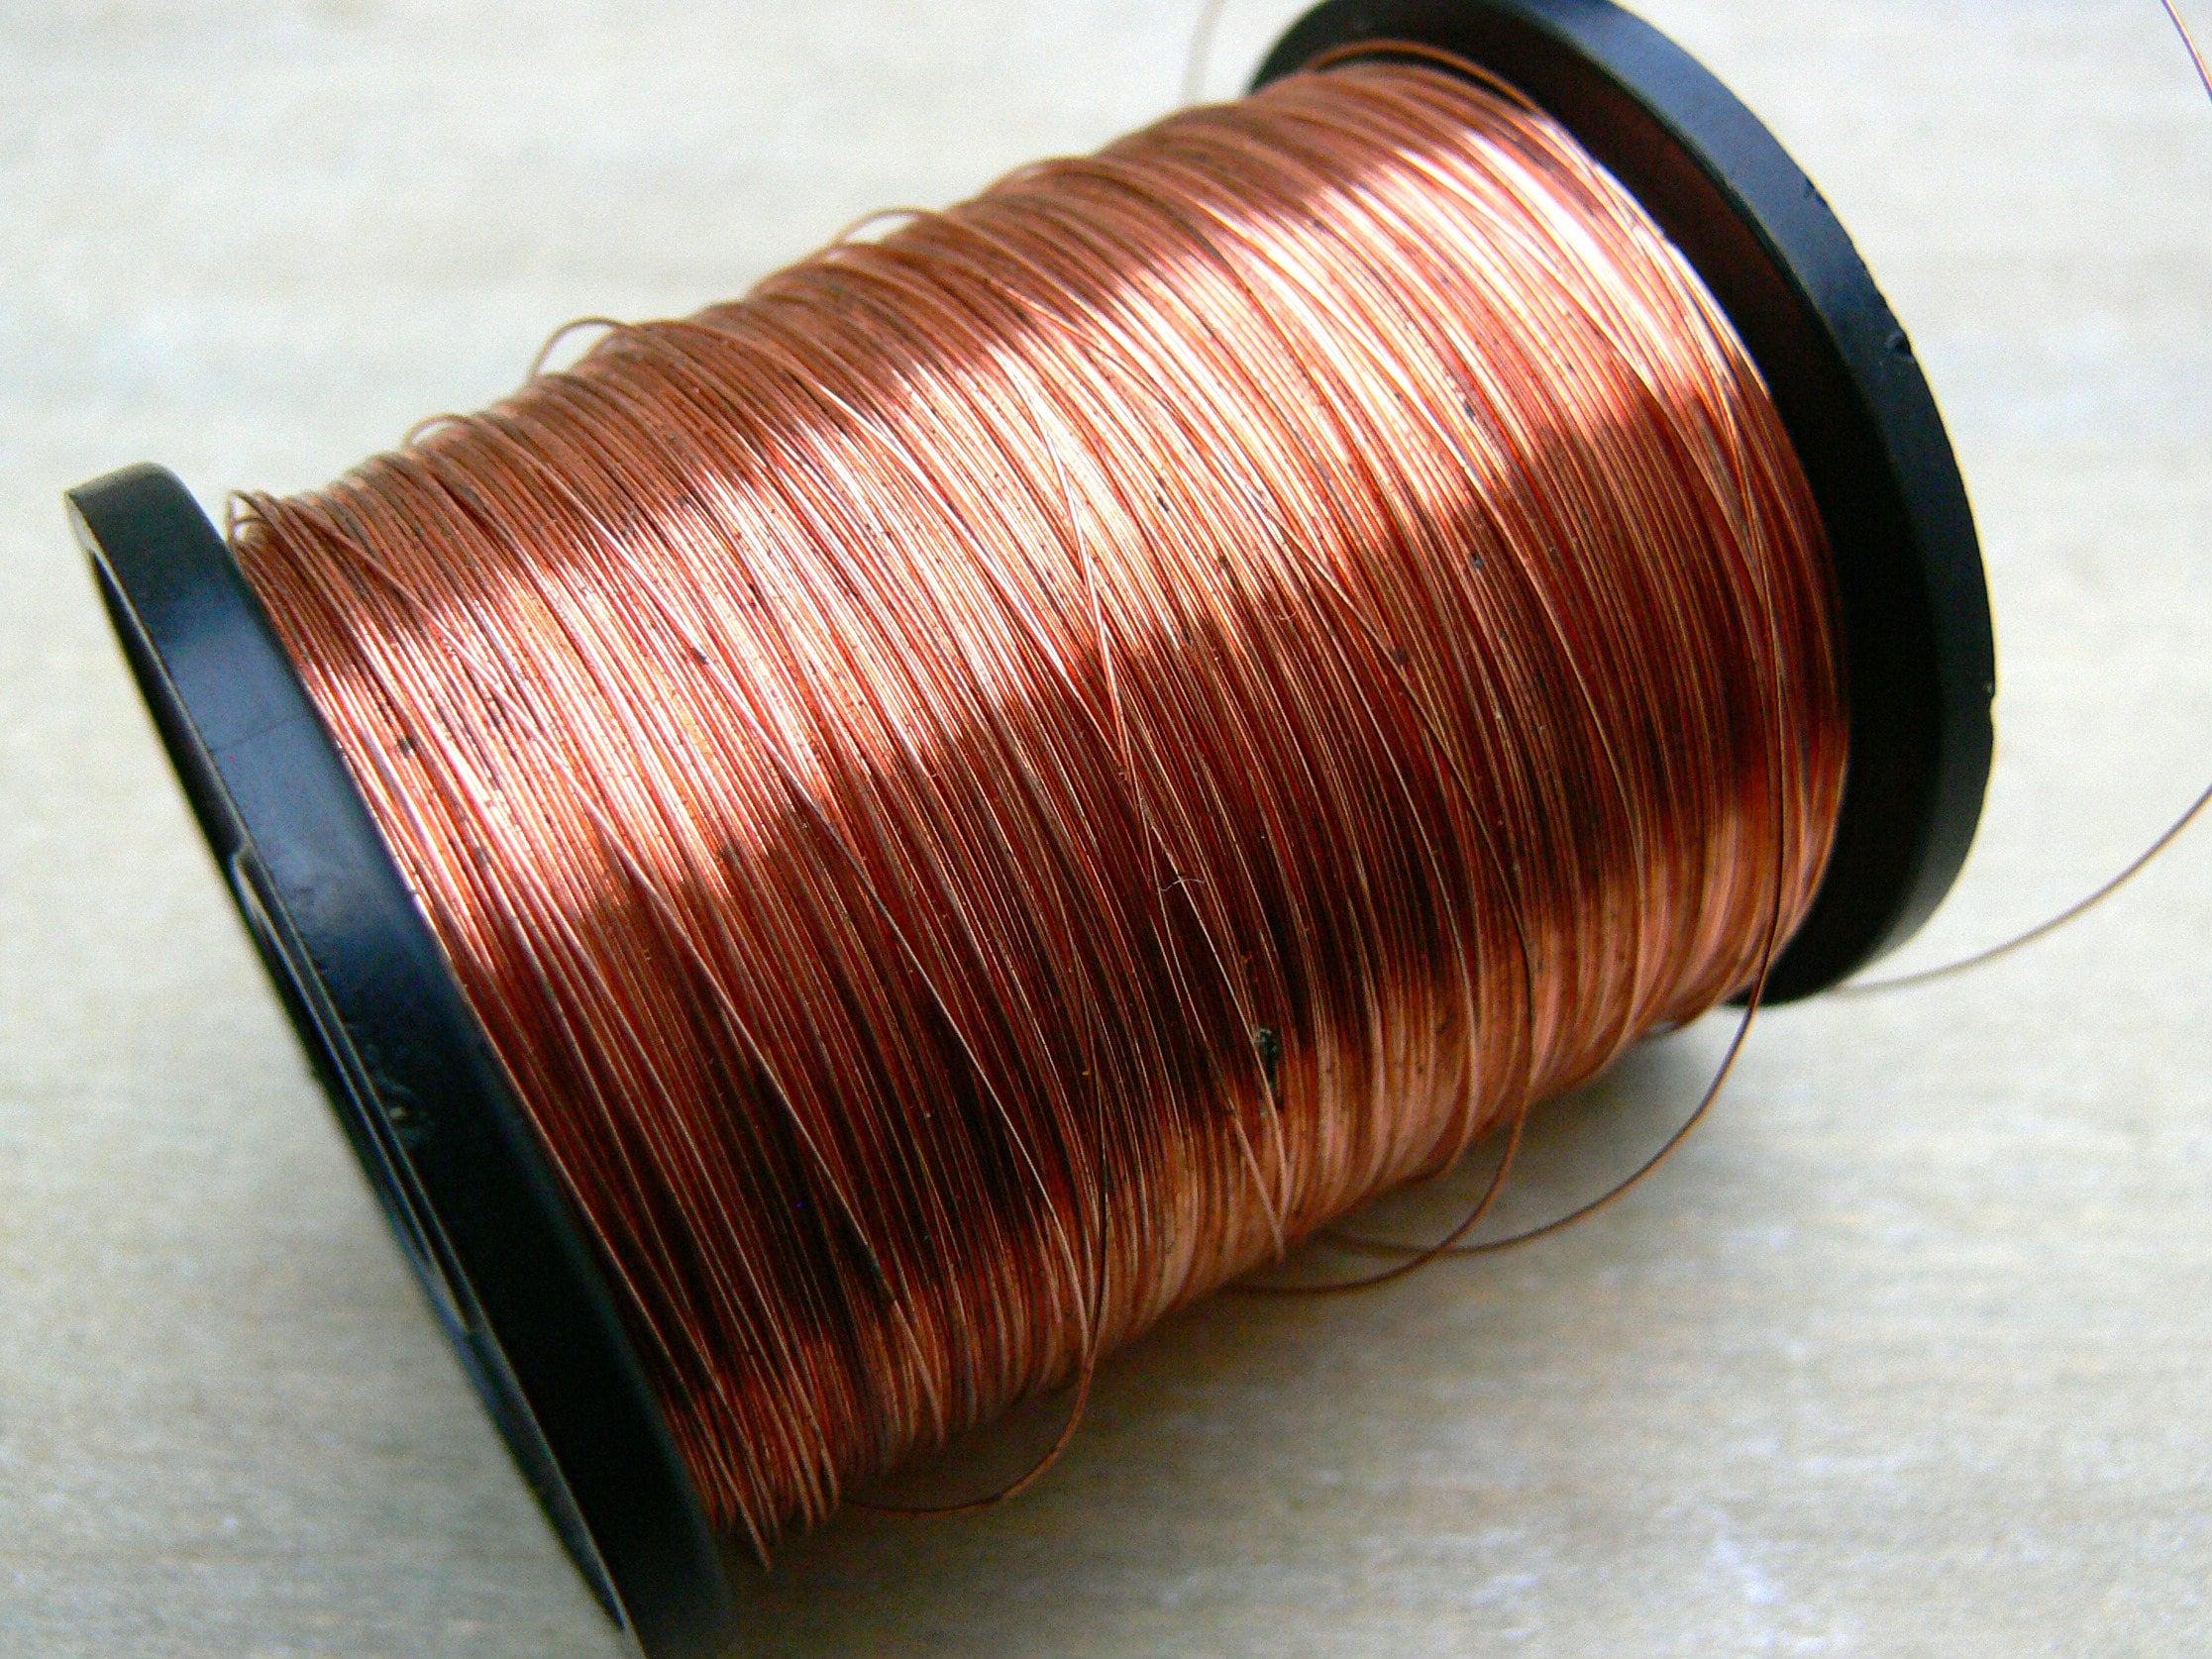 0315 mm rund Kupferdraht 28g Kupfer Draht nackten